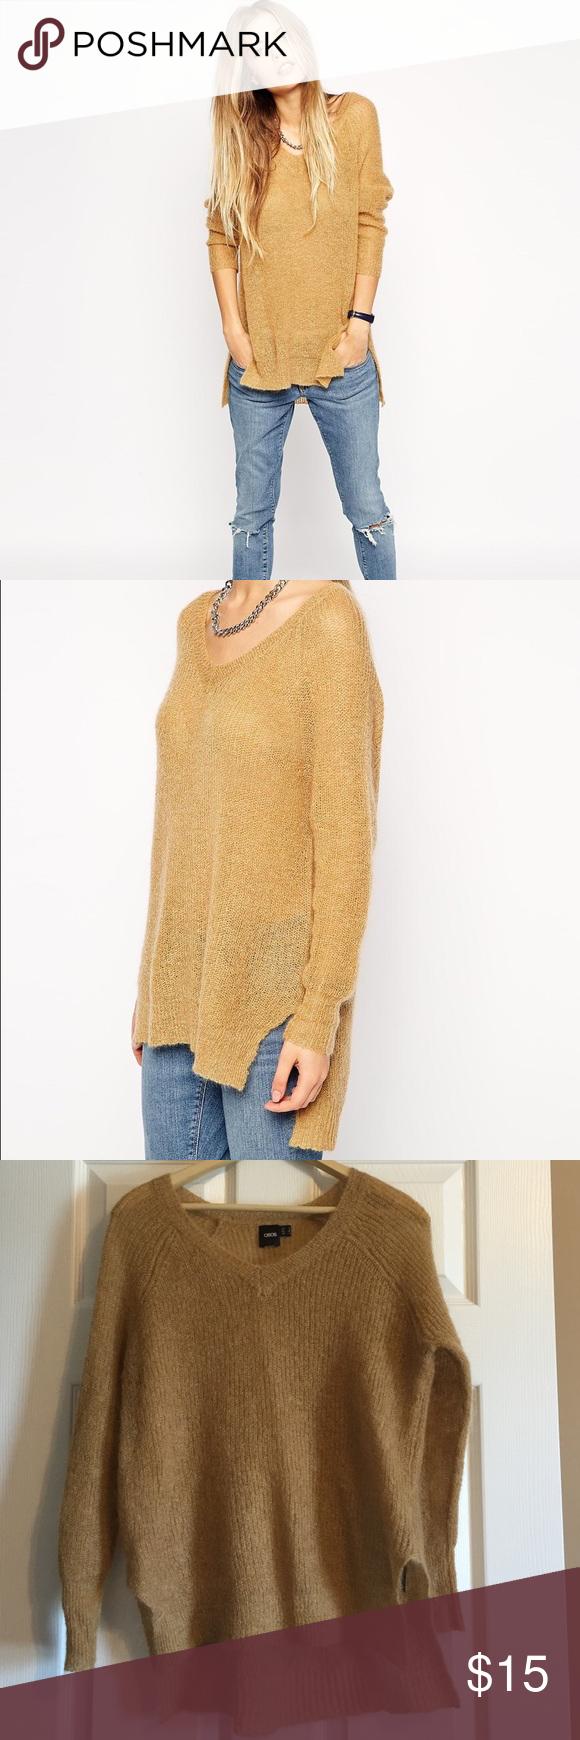 ASOS Mohair Slouchy Sweater *NWOT *43% Mohair, 29% Nylon, 28% Acrylic ASOS Sweaters V-Necks